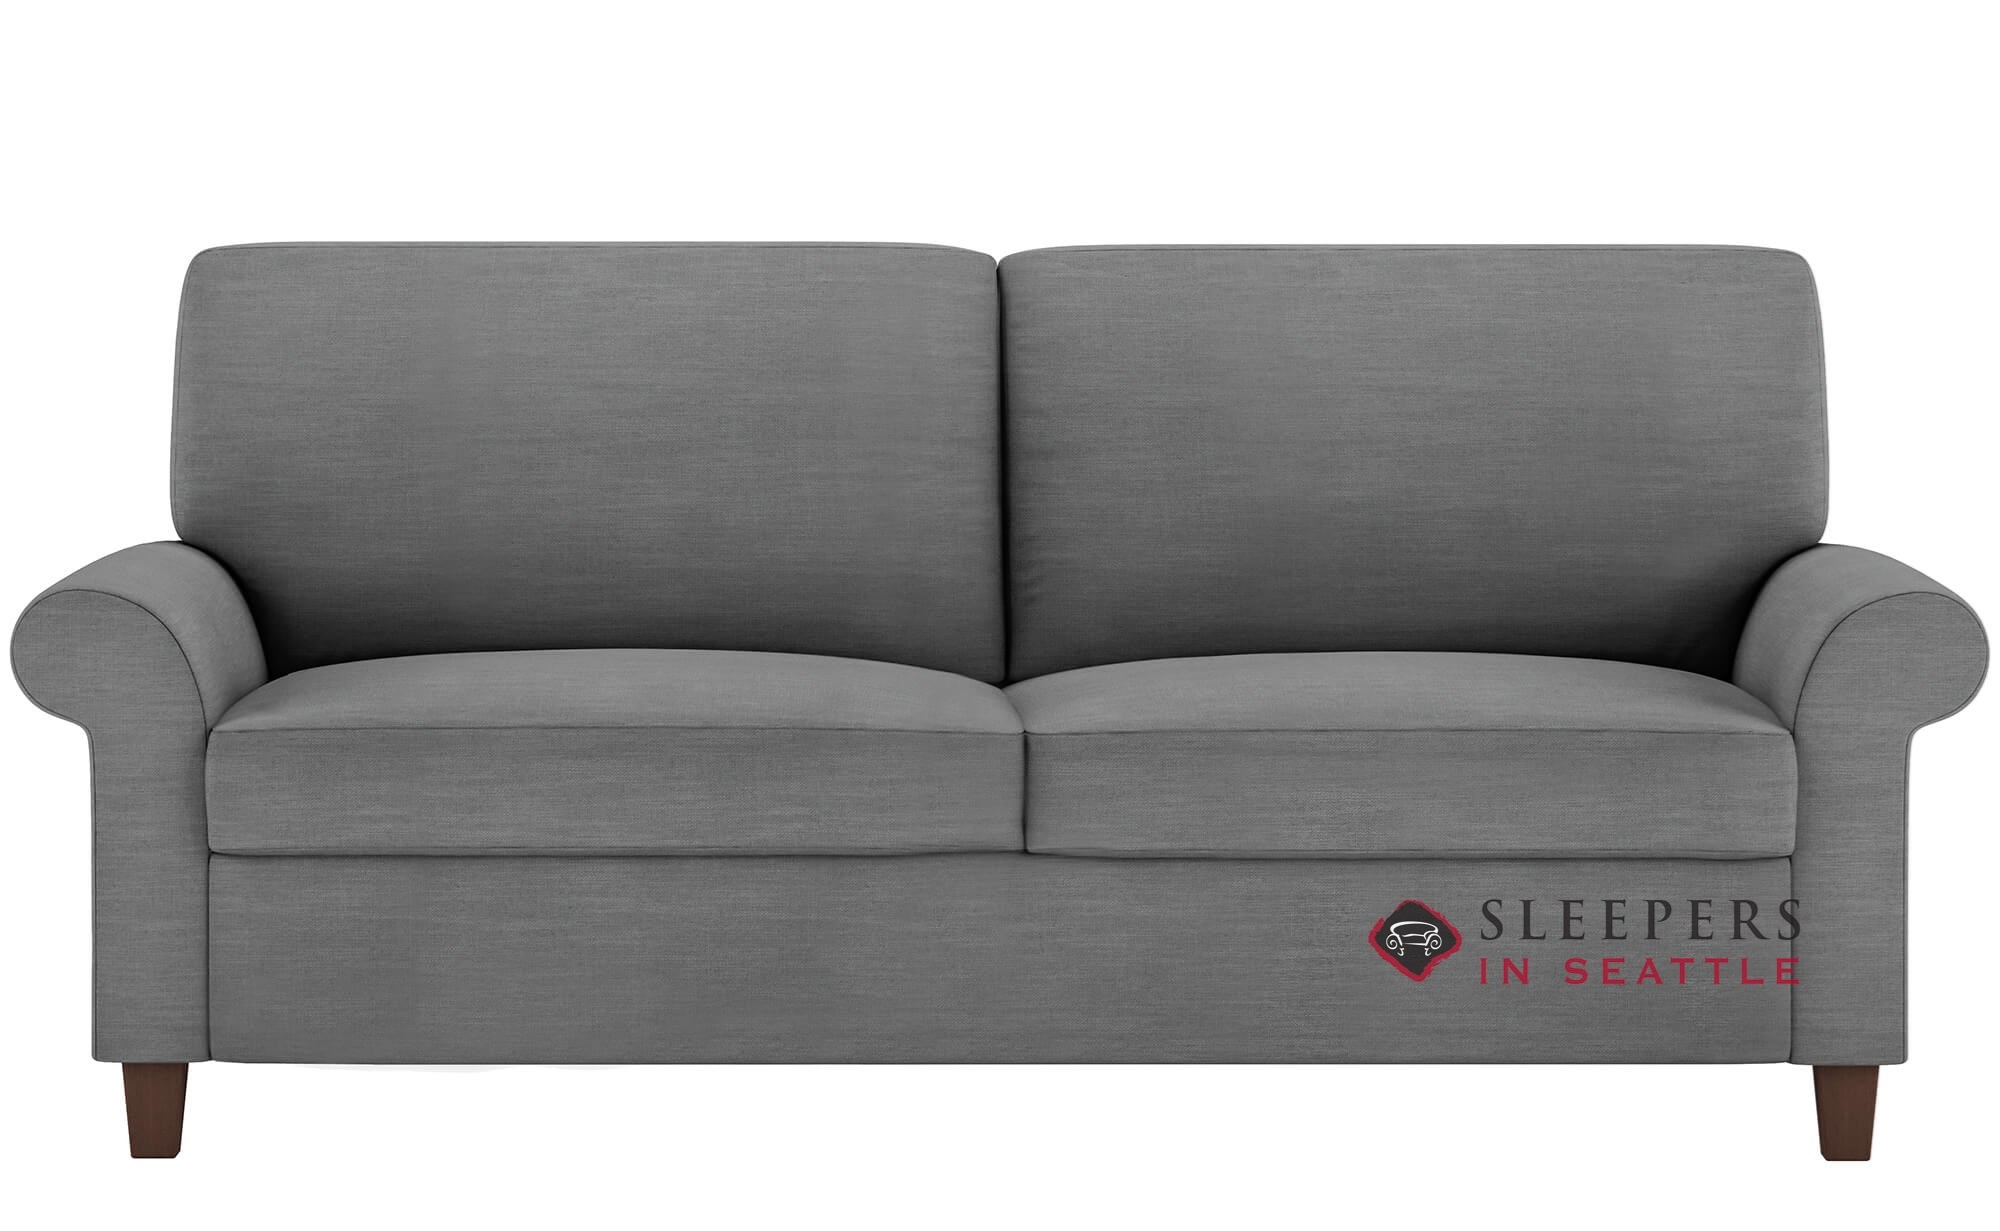 American Leather Gibbs High Leg Queen Comfort Sleeper (Generation VIII)